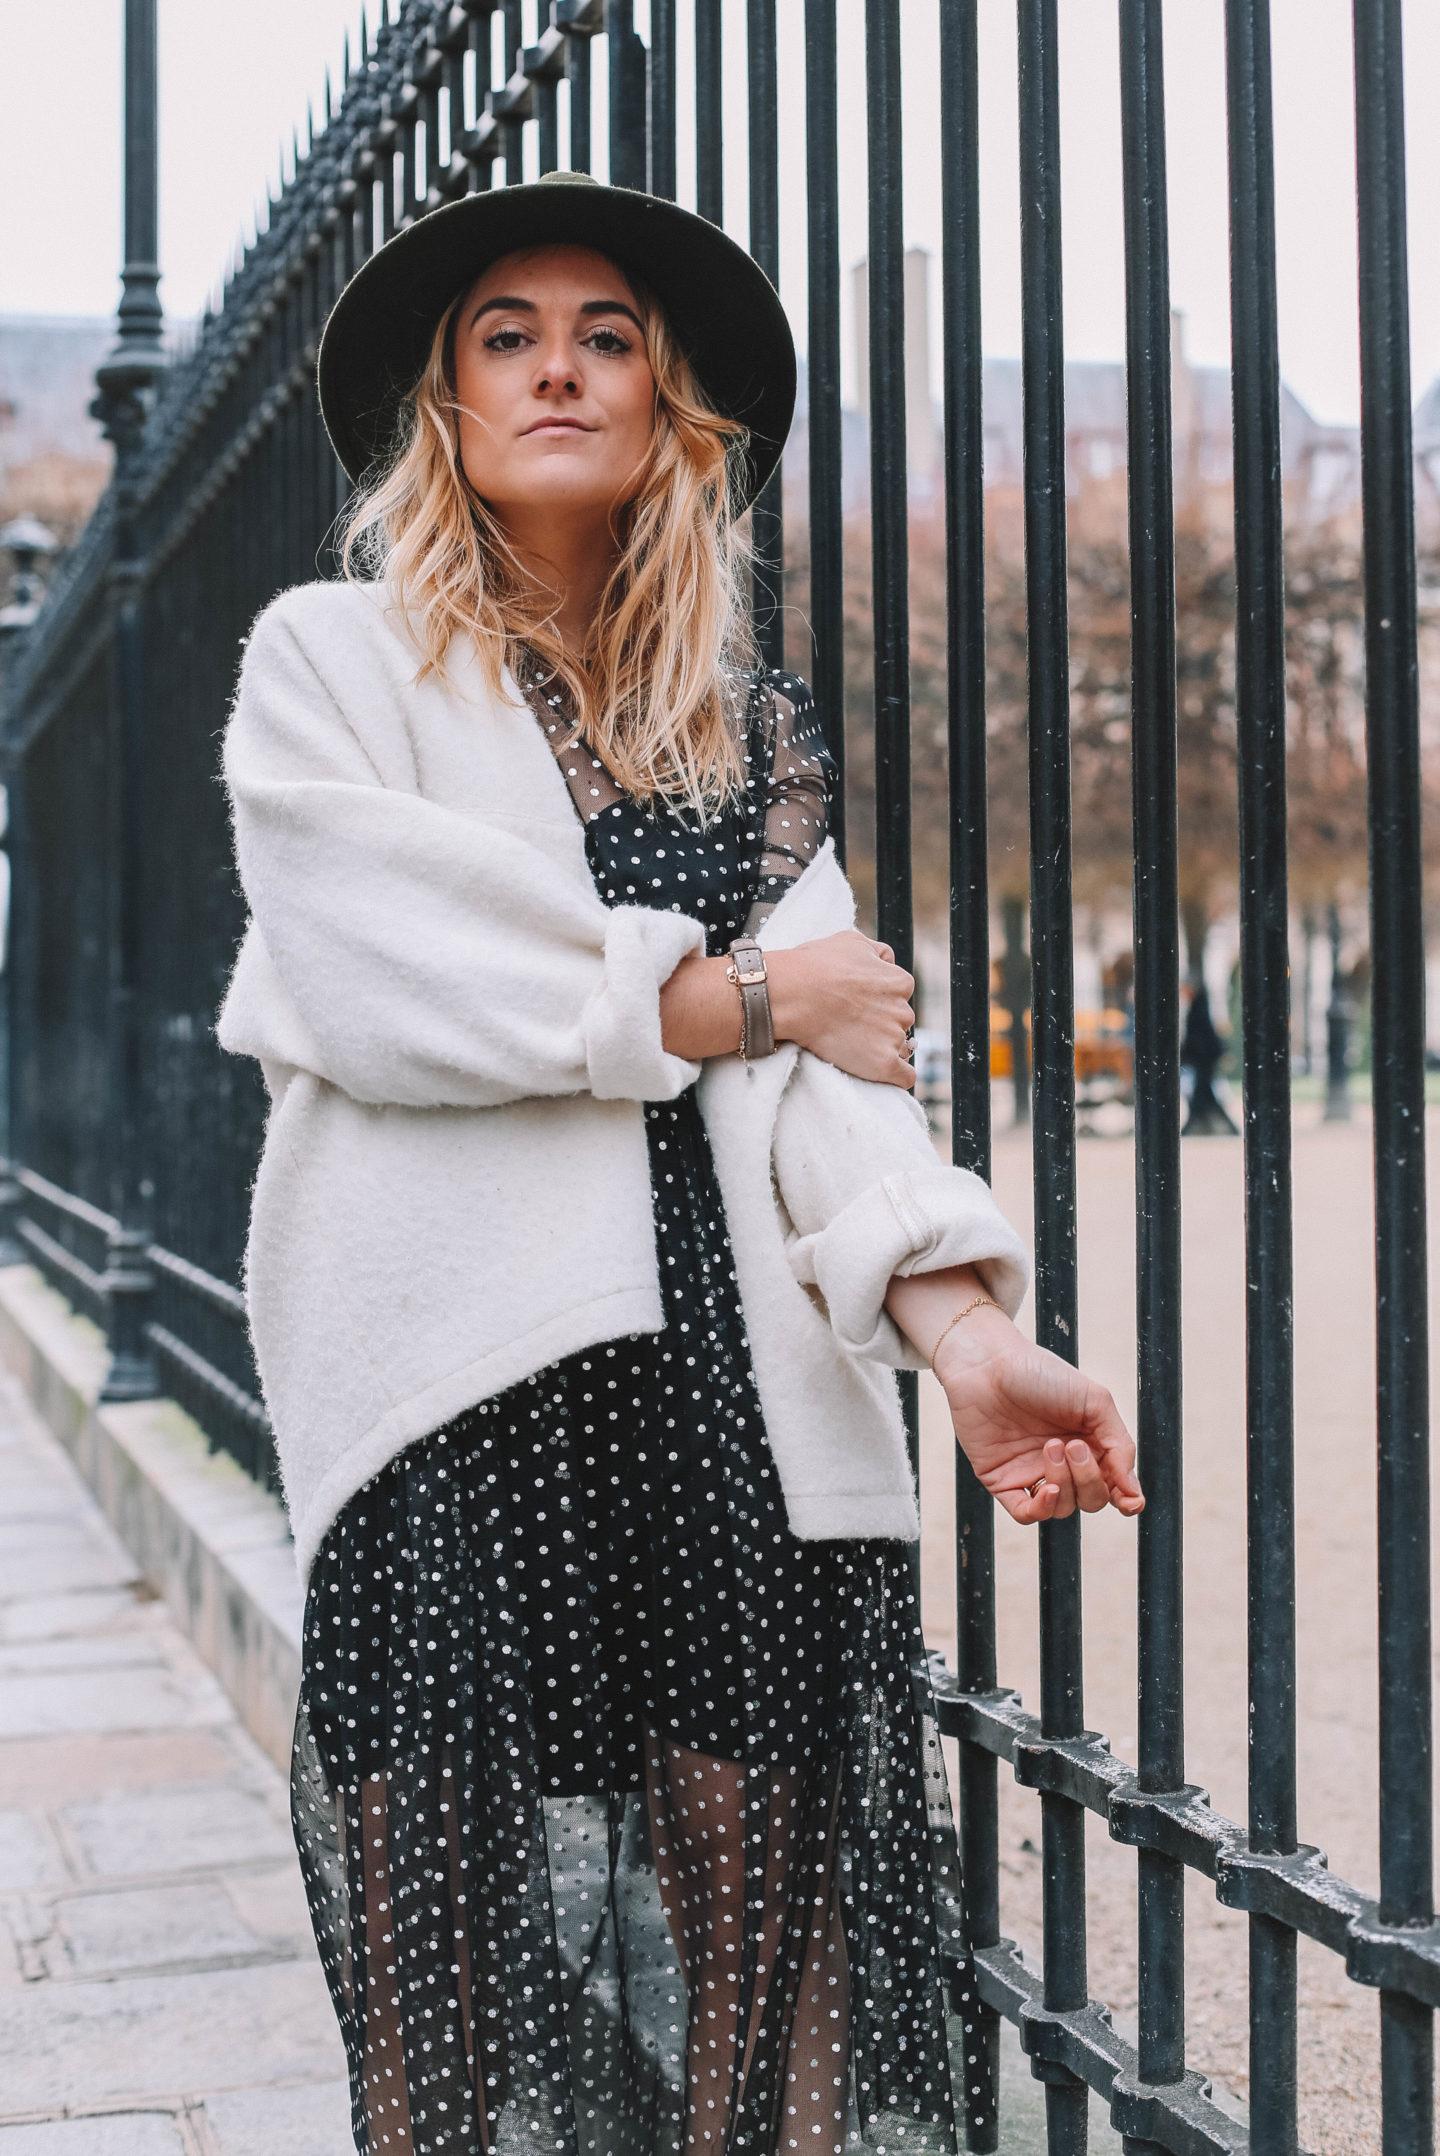 Gilet blanc Lei 1984 - Blondie Baby blog mode et voyages